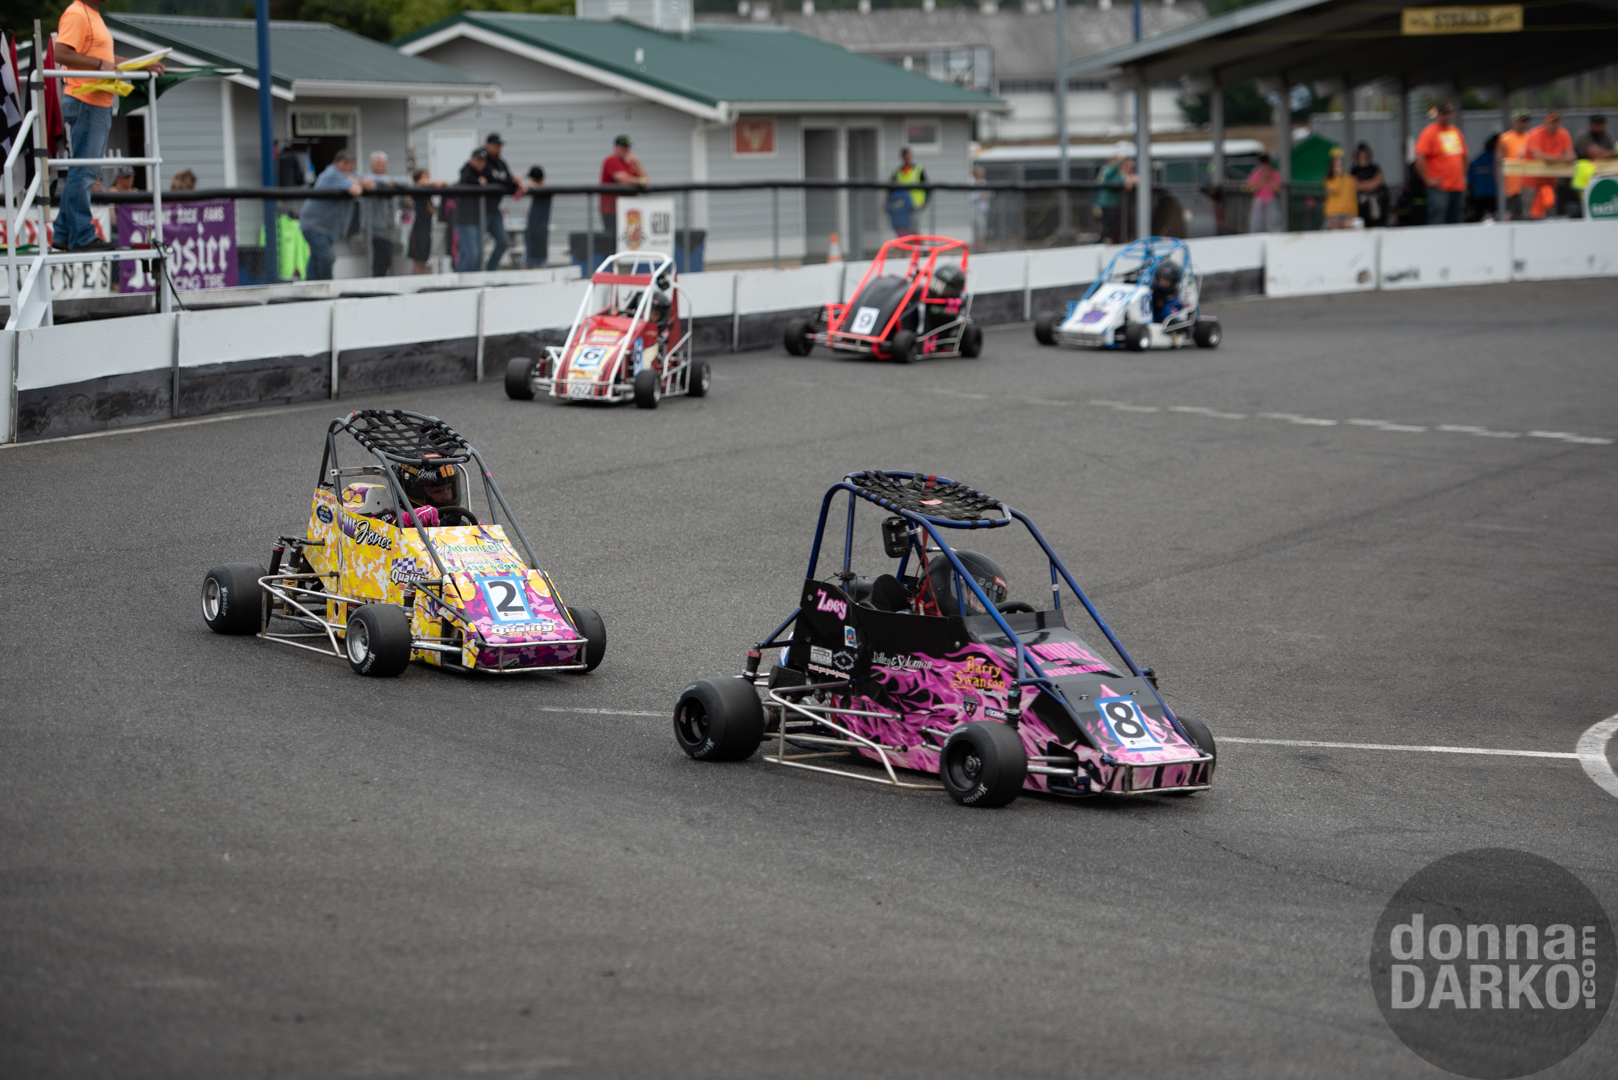 QWMA (Racing) 8-11-2019 DSC_6337.jpg